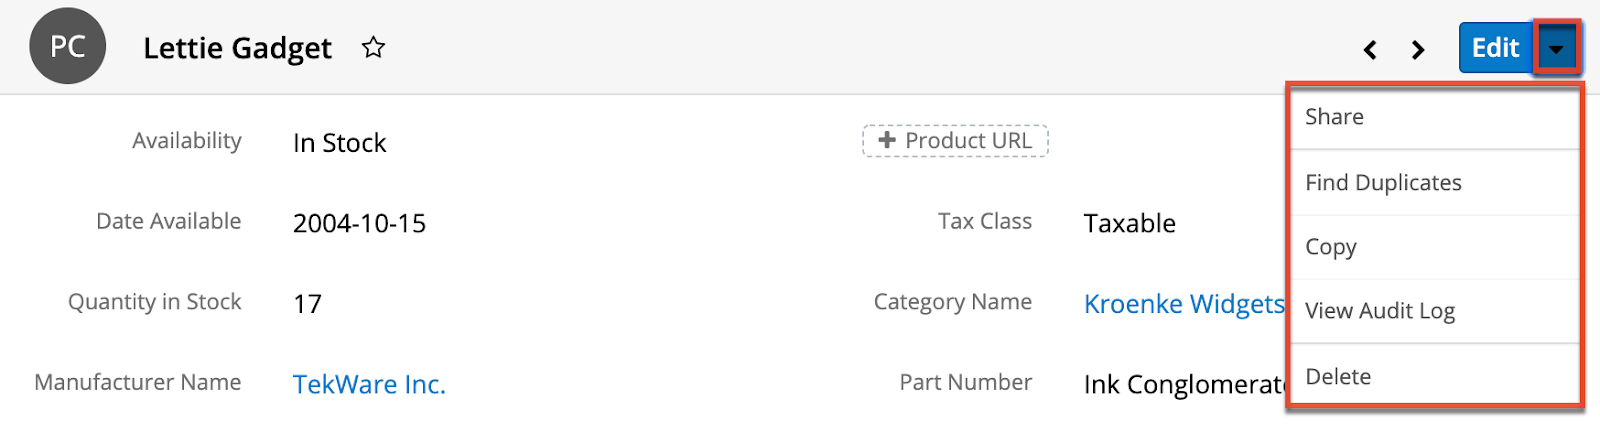 bhea-sugarcrm-product catalog